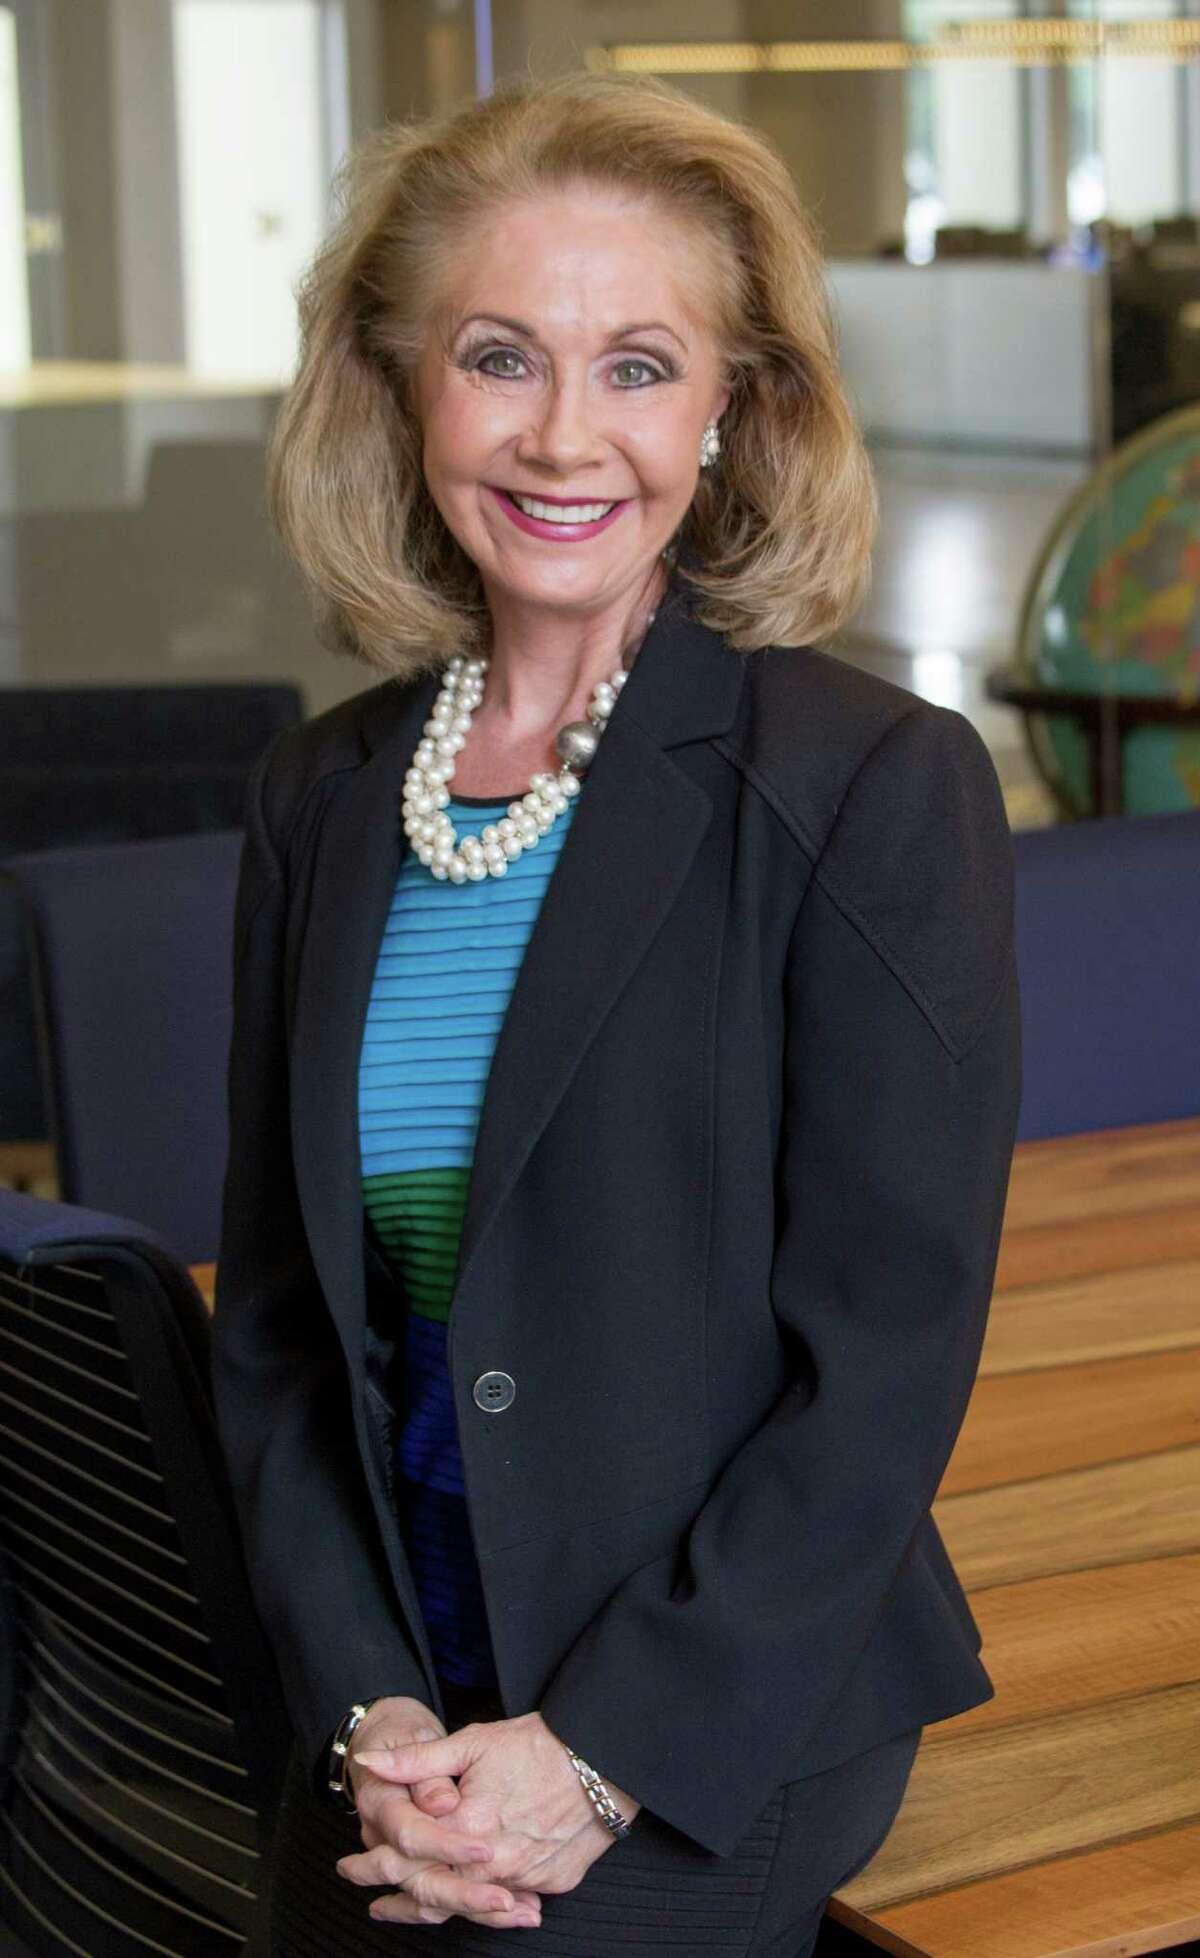 Debra Lehrmann is seeking re-election to the Texas Supreme Court, Place 3. (Photo: JeremyCarter/ Houston Chronicle)